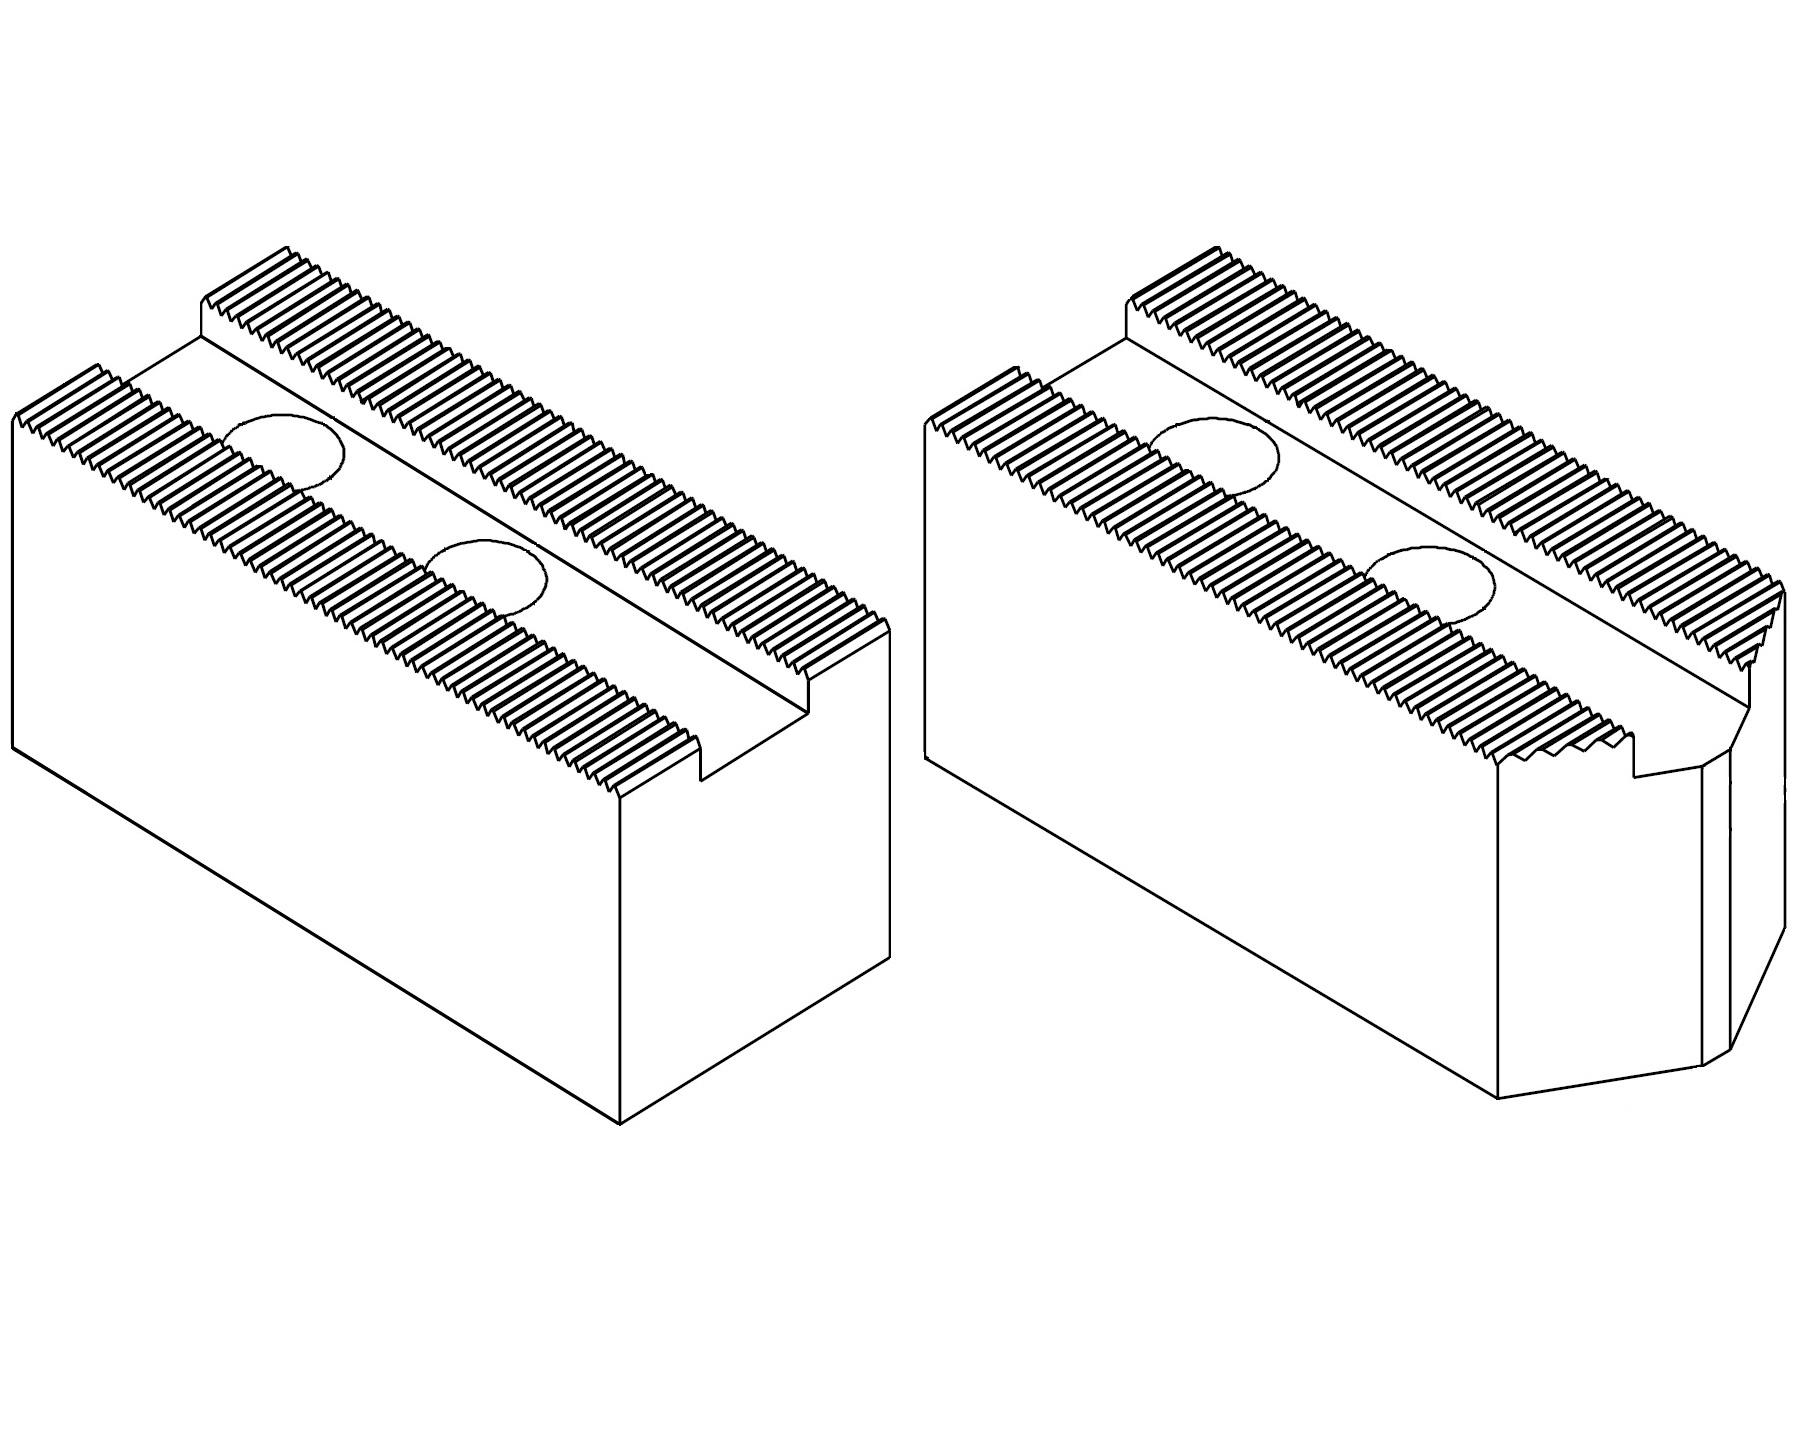 Čelisti měkké 1,5x60°, šířka drážky - 22 (sklíčidla pr. 380-450mm)